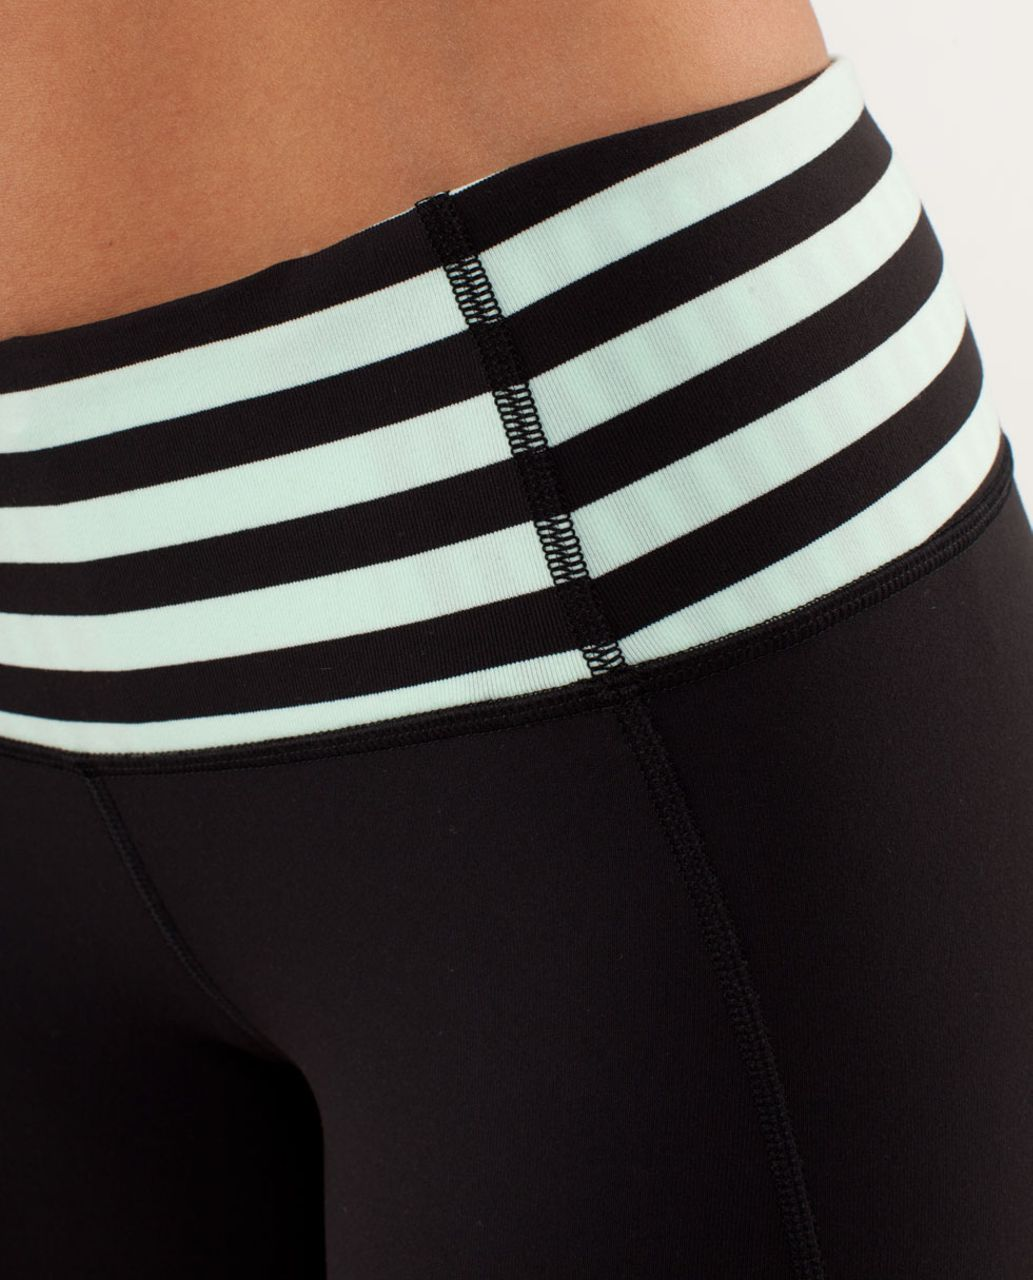 Lululemon Gather & Crow Crop - Black / Sea Stripe Mint Moment Black / Classic Stripe Mint Moment Black